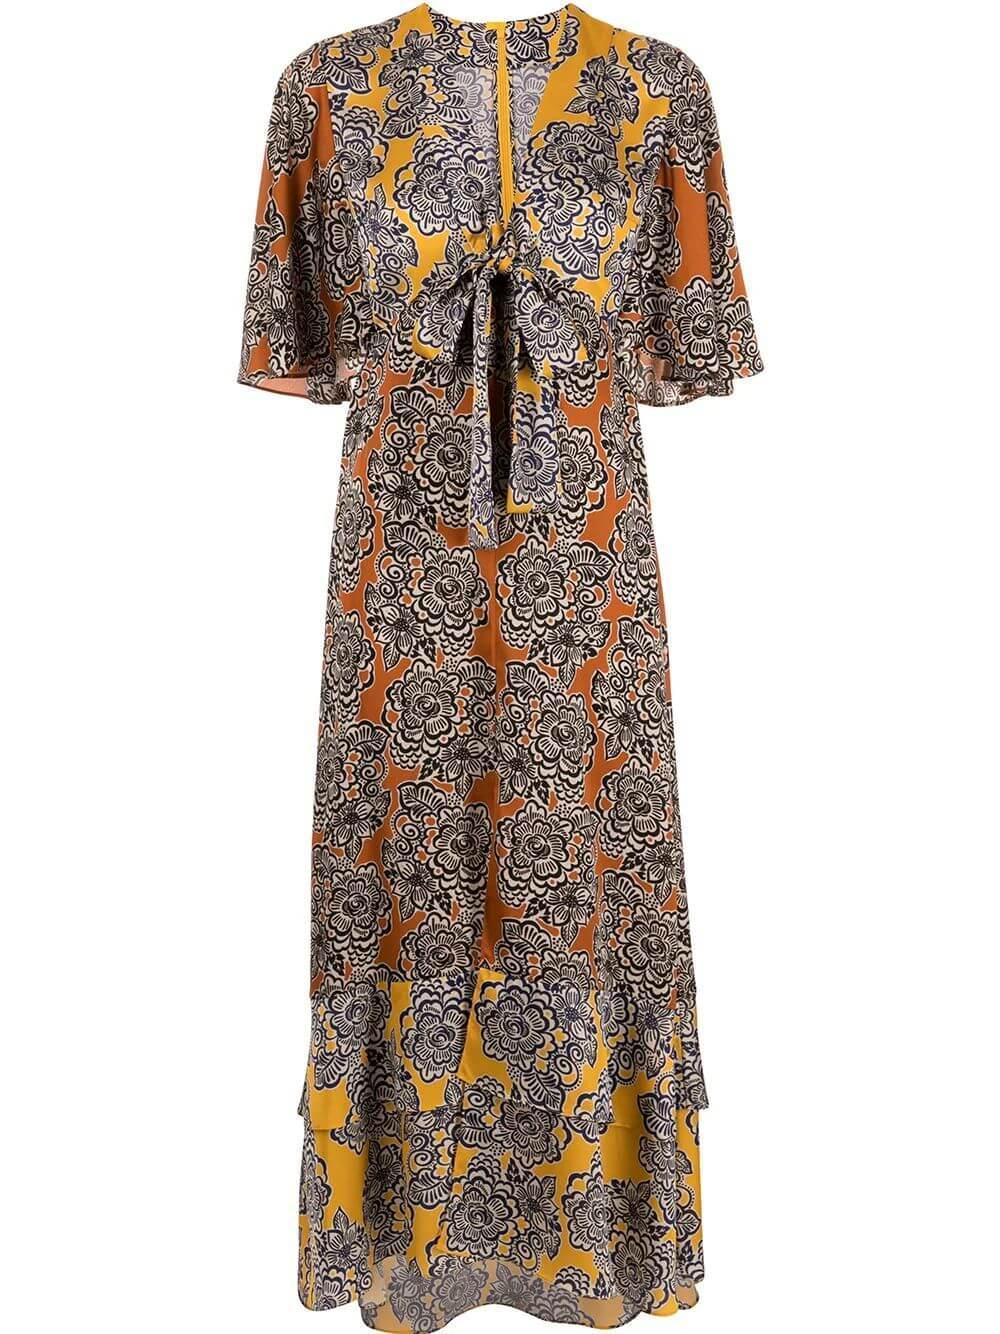 Rajana Printed Dress